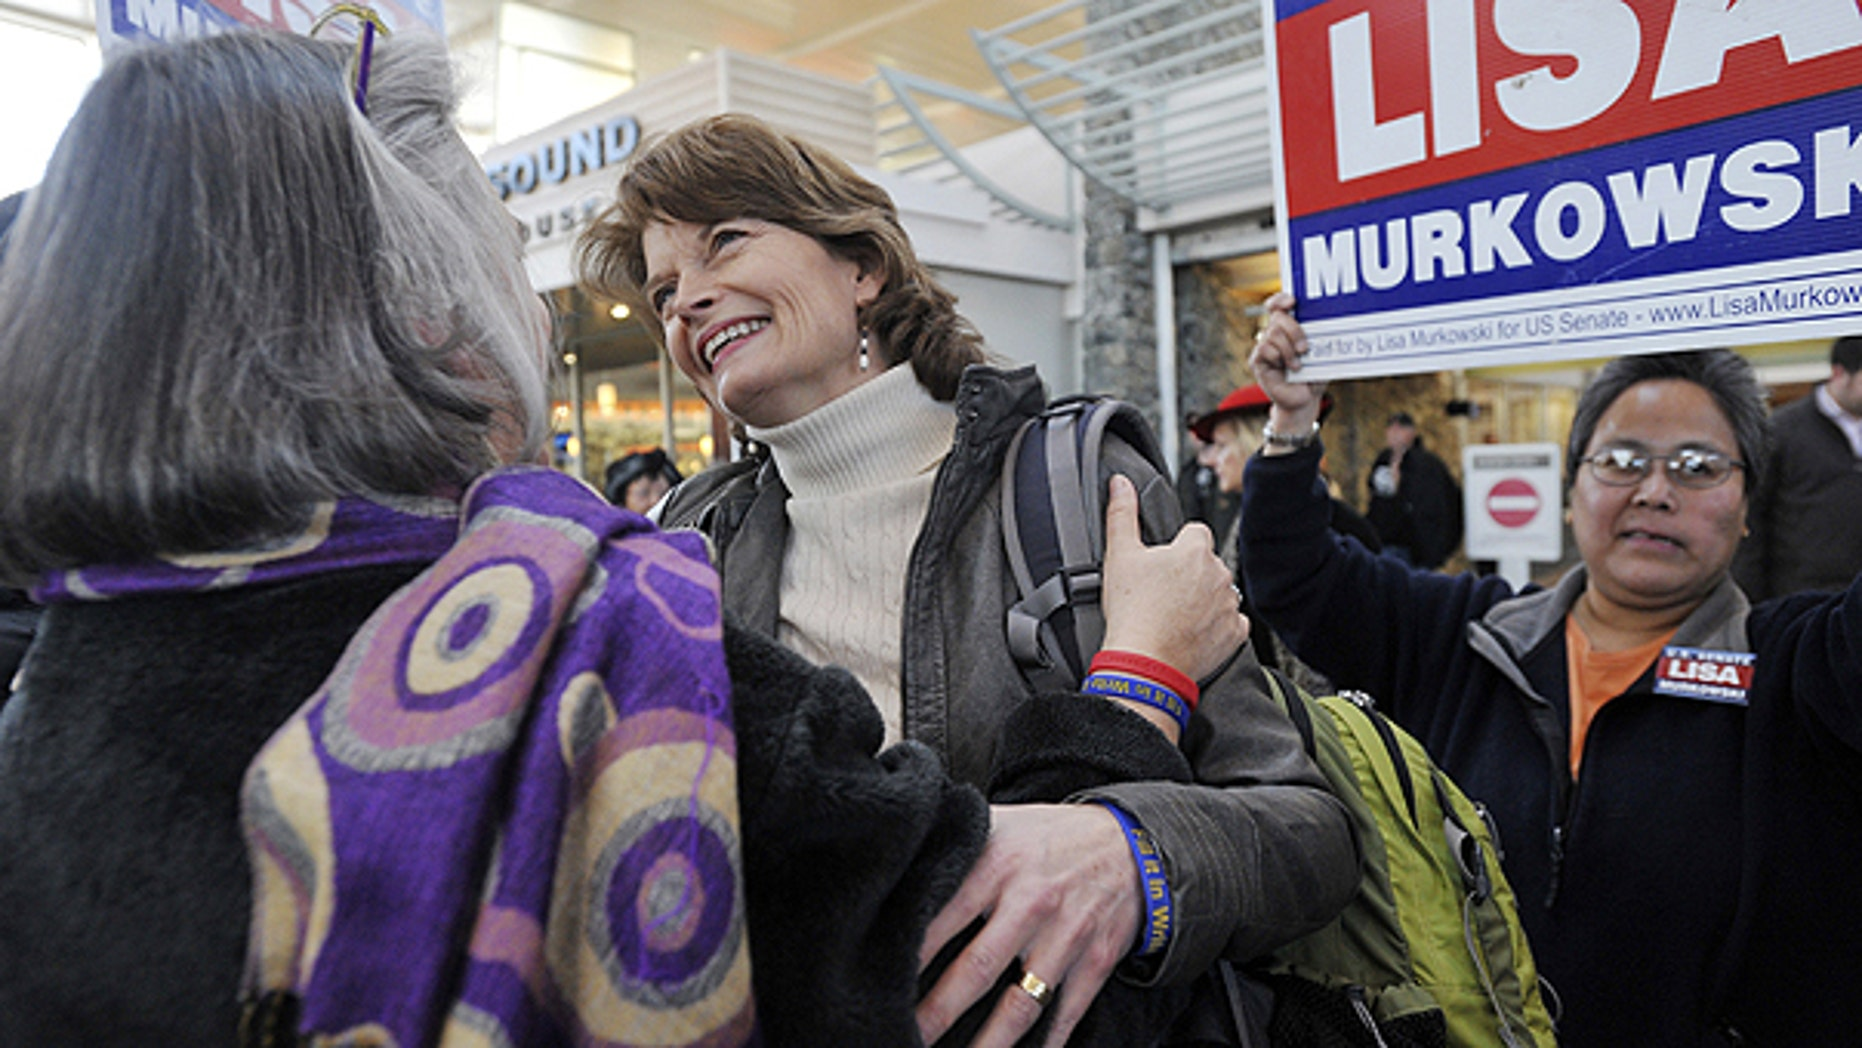 Nov. 17: U.S. Senator Lisa Murkowski (R) Alaska, center, is greeted by her sister Carol Sturgelewski, left, upon her arrival at Ted Stevens International Airport in Anchorage.